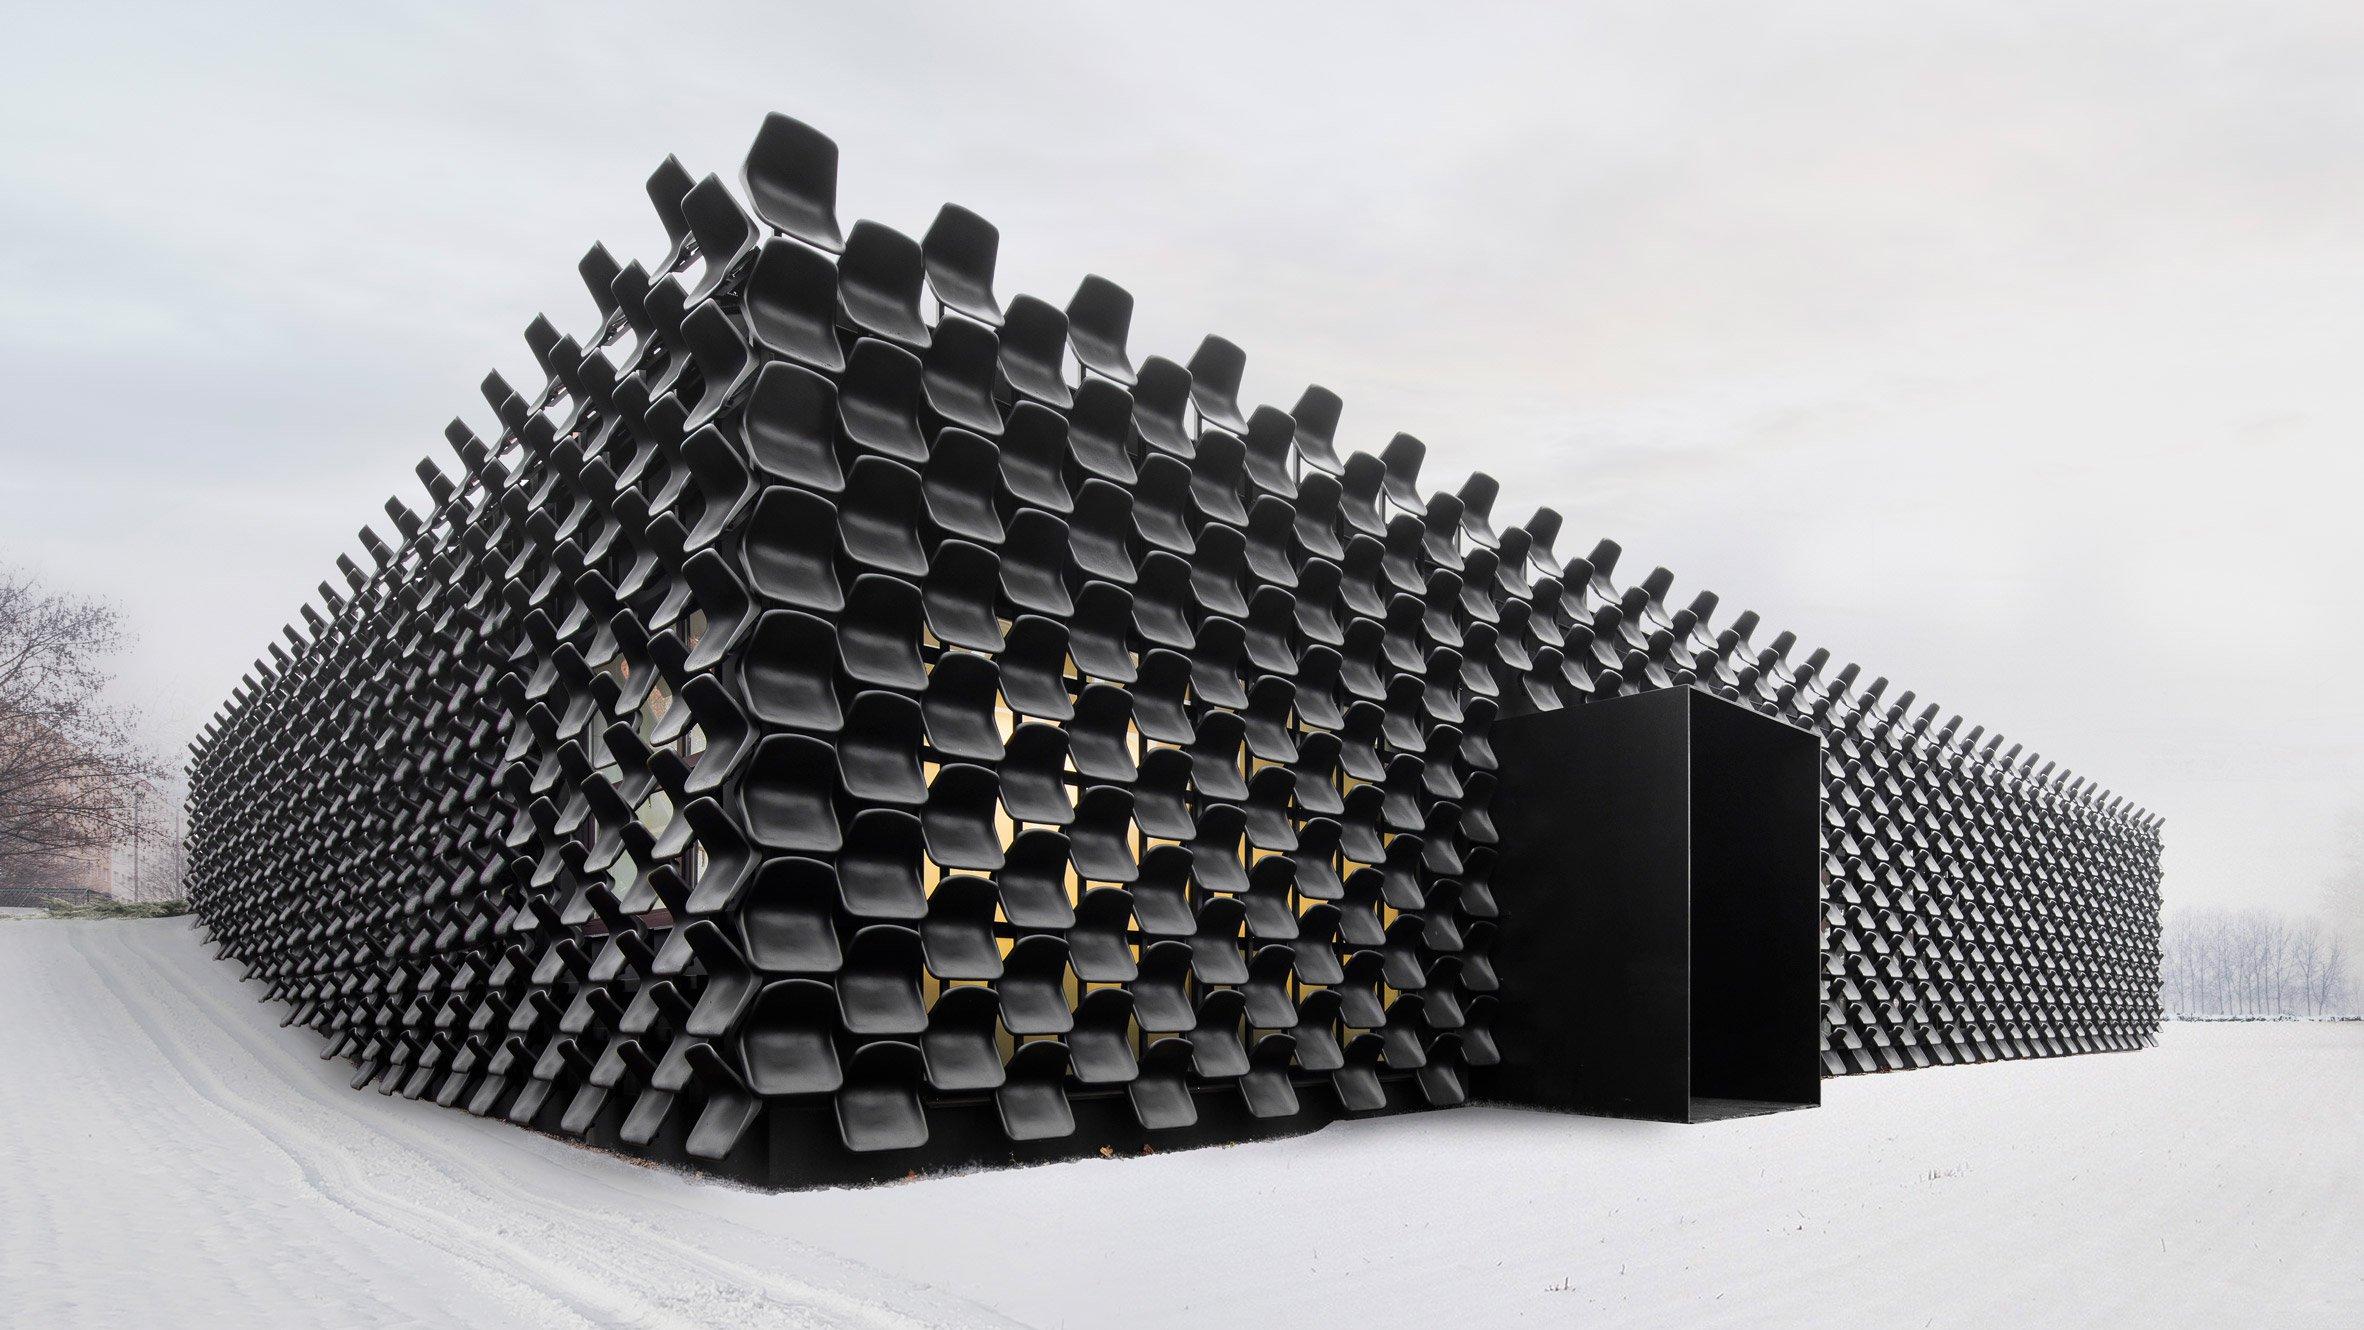 gallery-furniture-chybik-kistof-architecture-retail-czech-republic_dezeen_hero-a.jpg